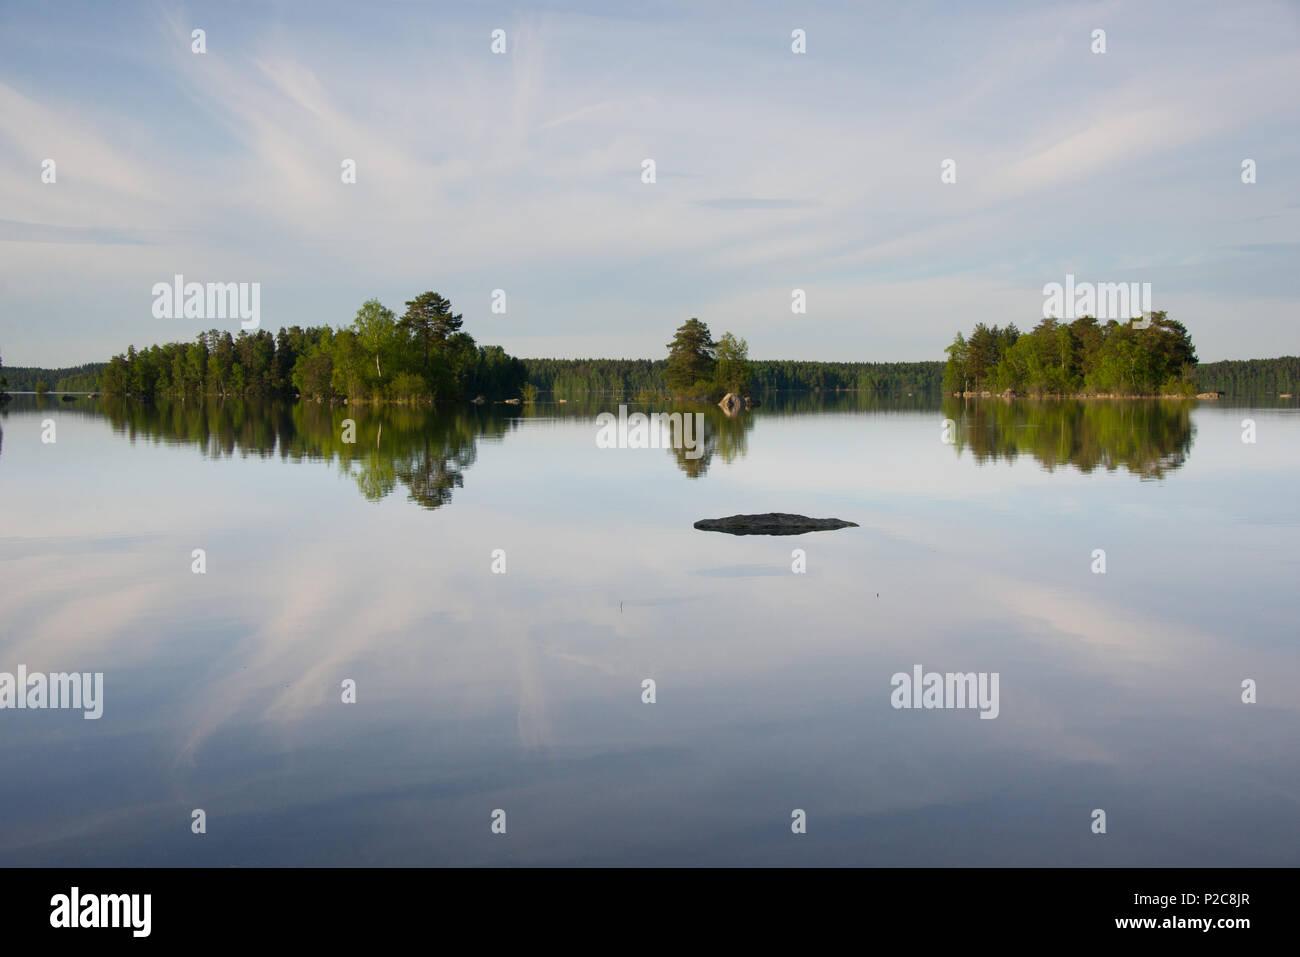 Lake Kukkia water reflections. Lake Kukkia, Luopioinen, Finland. - Stock Image